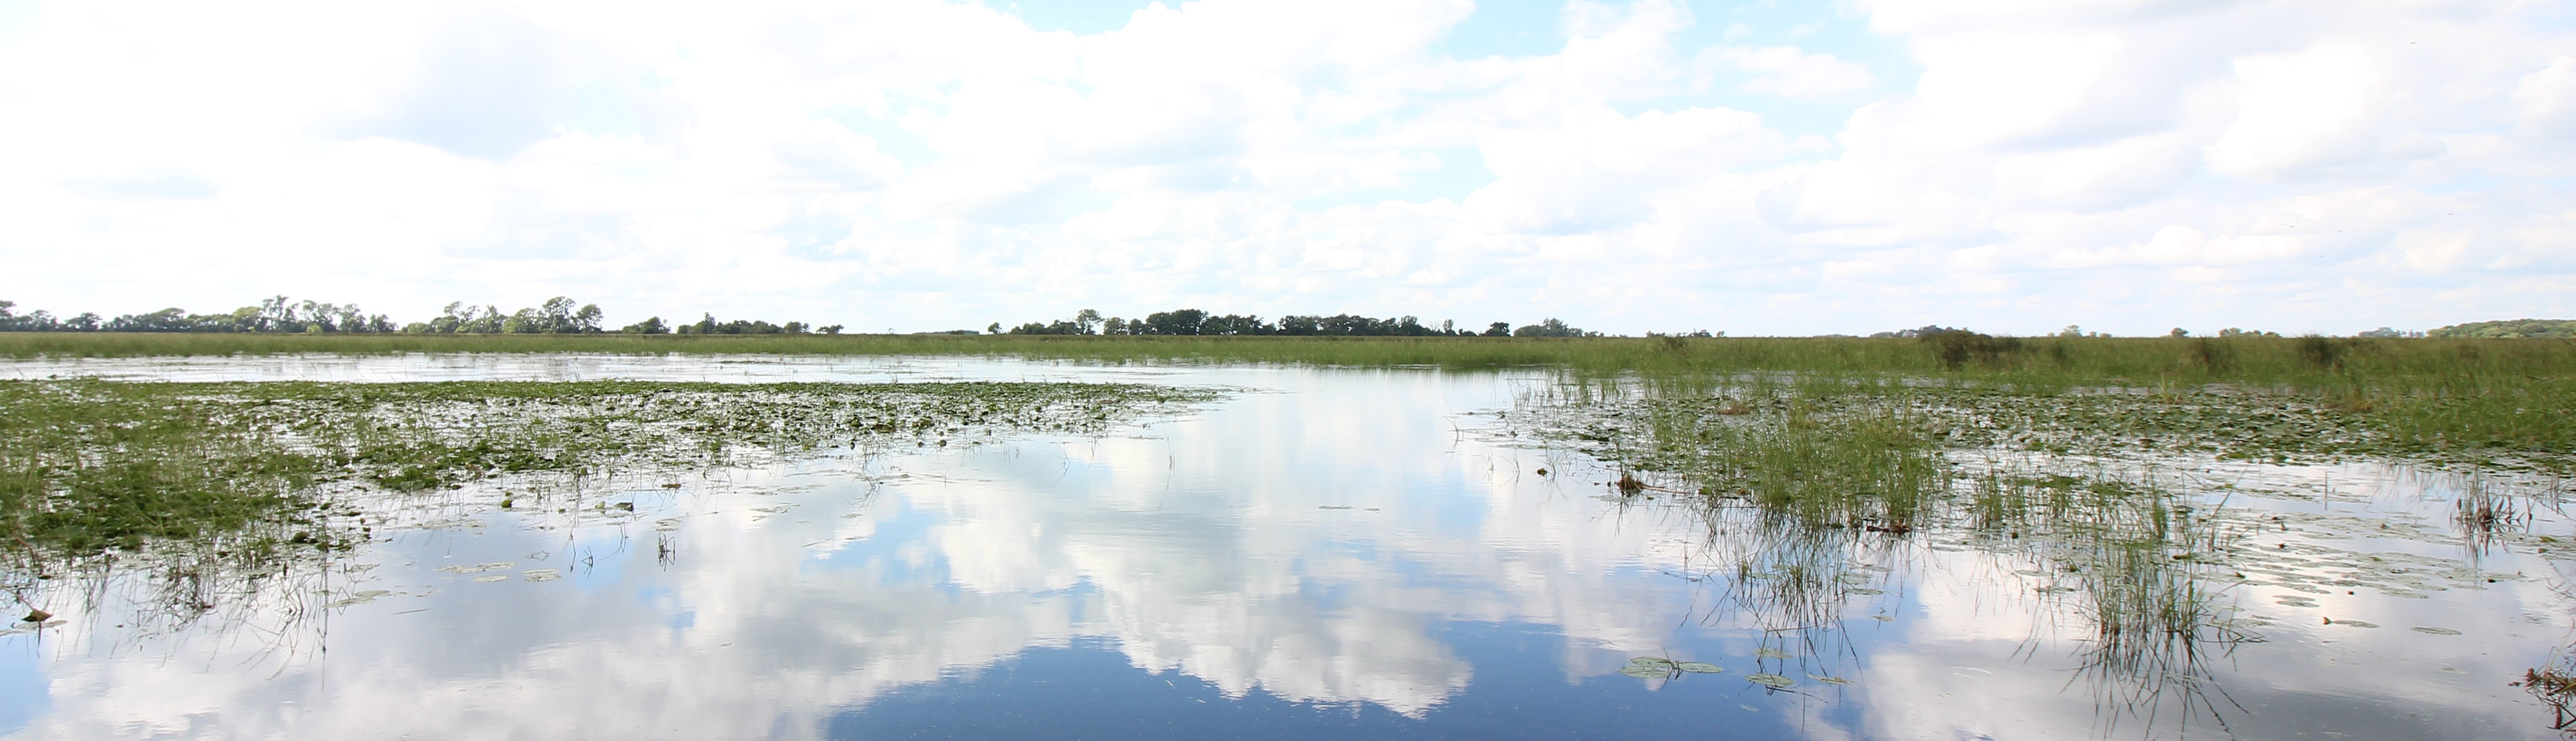 Iowa wetland